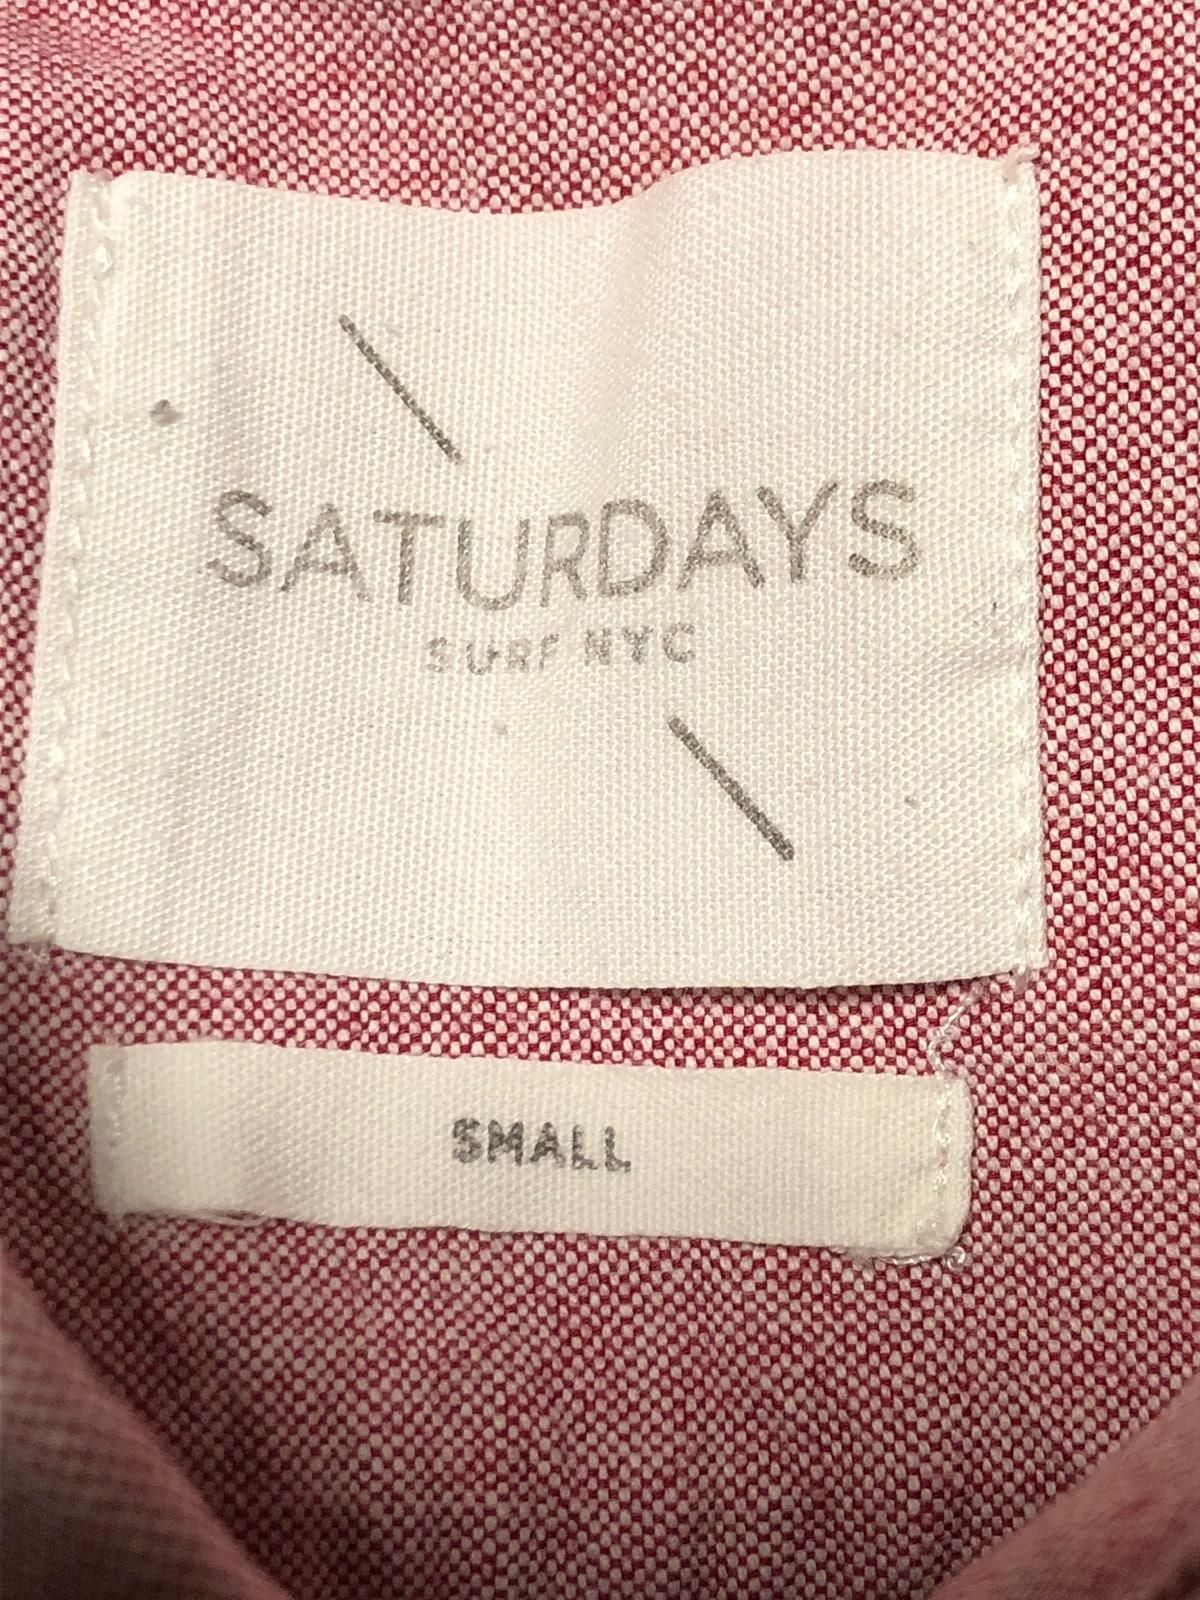 SATURDAYS SURF NYC(サタデーズ サーフ ニューヨーク)のシャツ